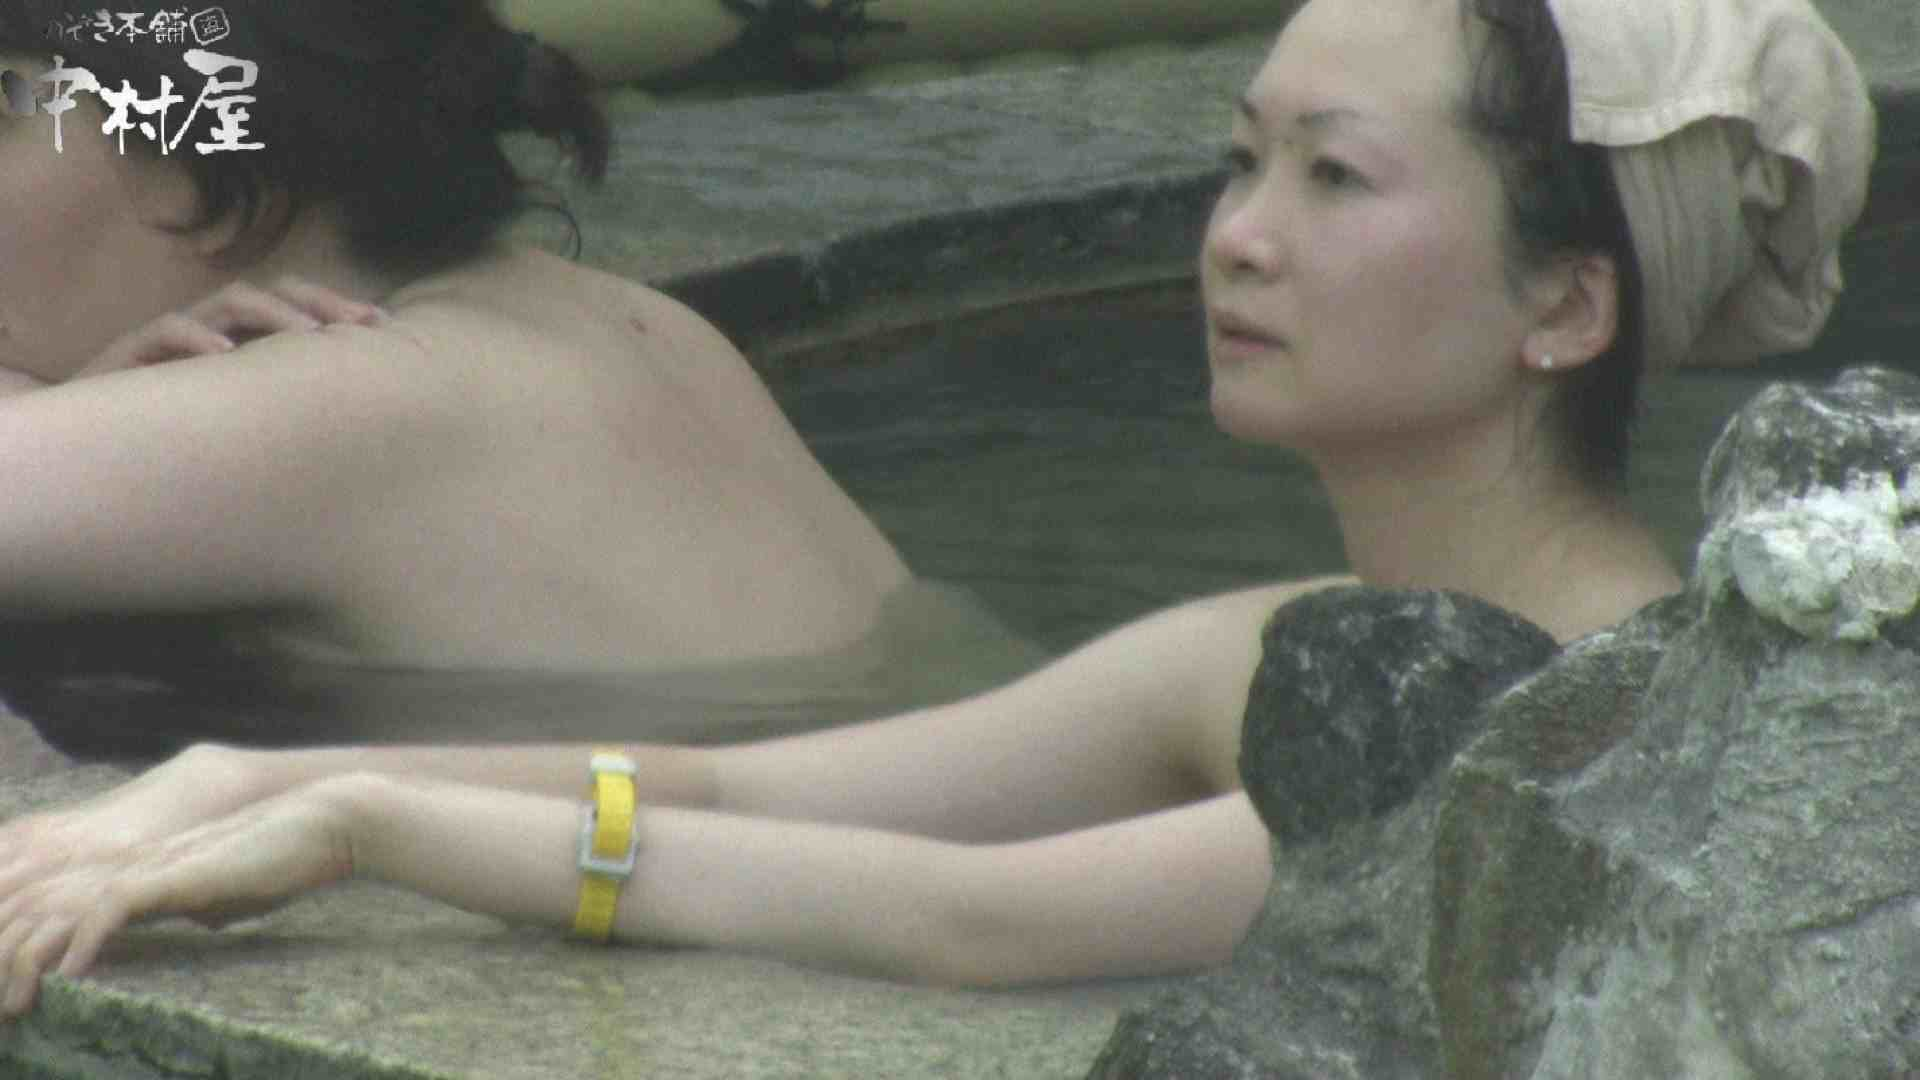 Aquaな露天風呂Vol.906 露天風呂編 | 盗撮シリーズ  86PIX 49